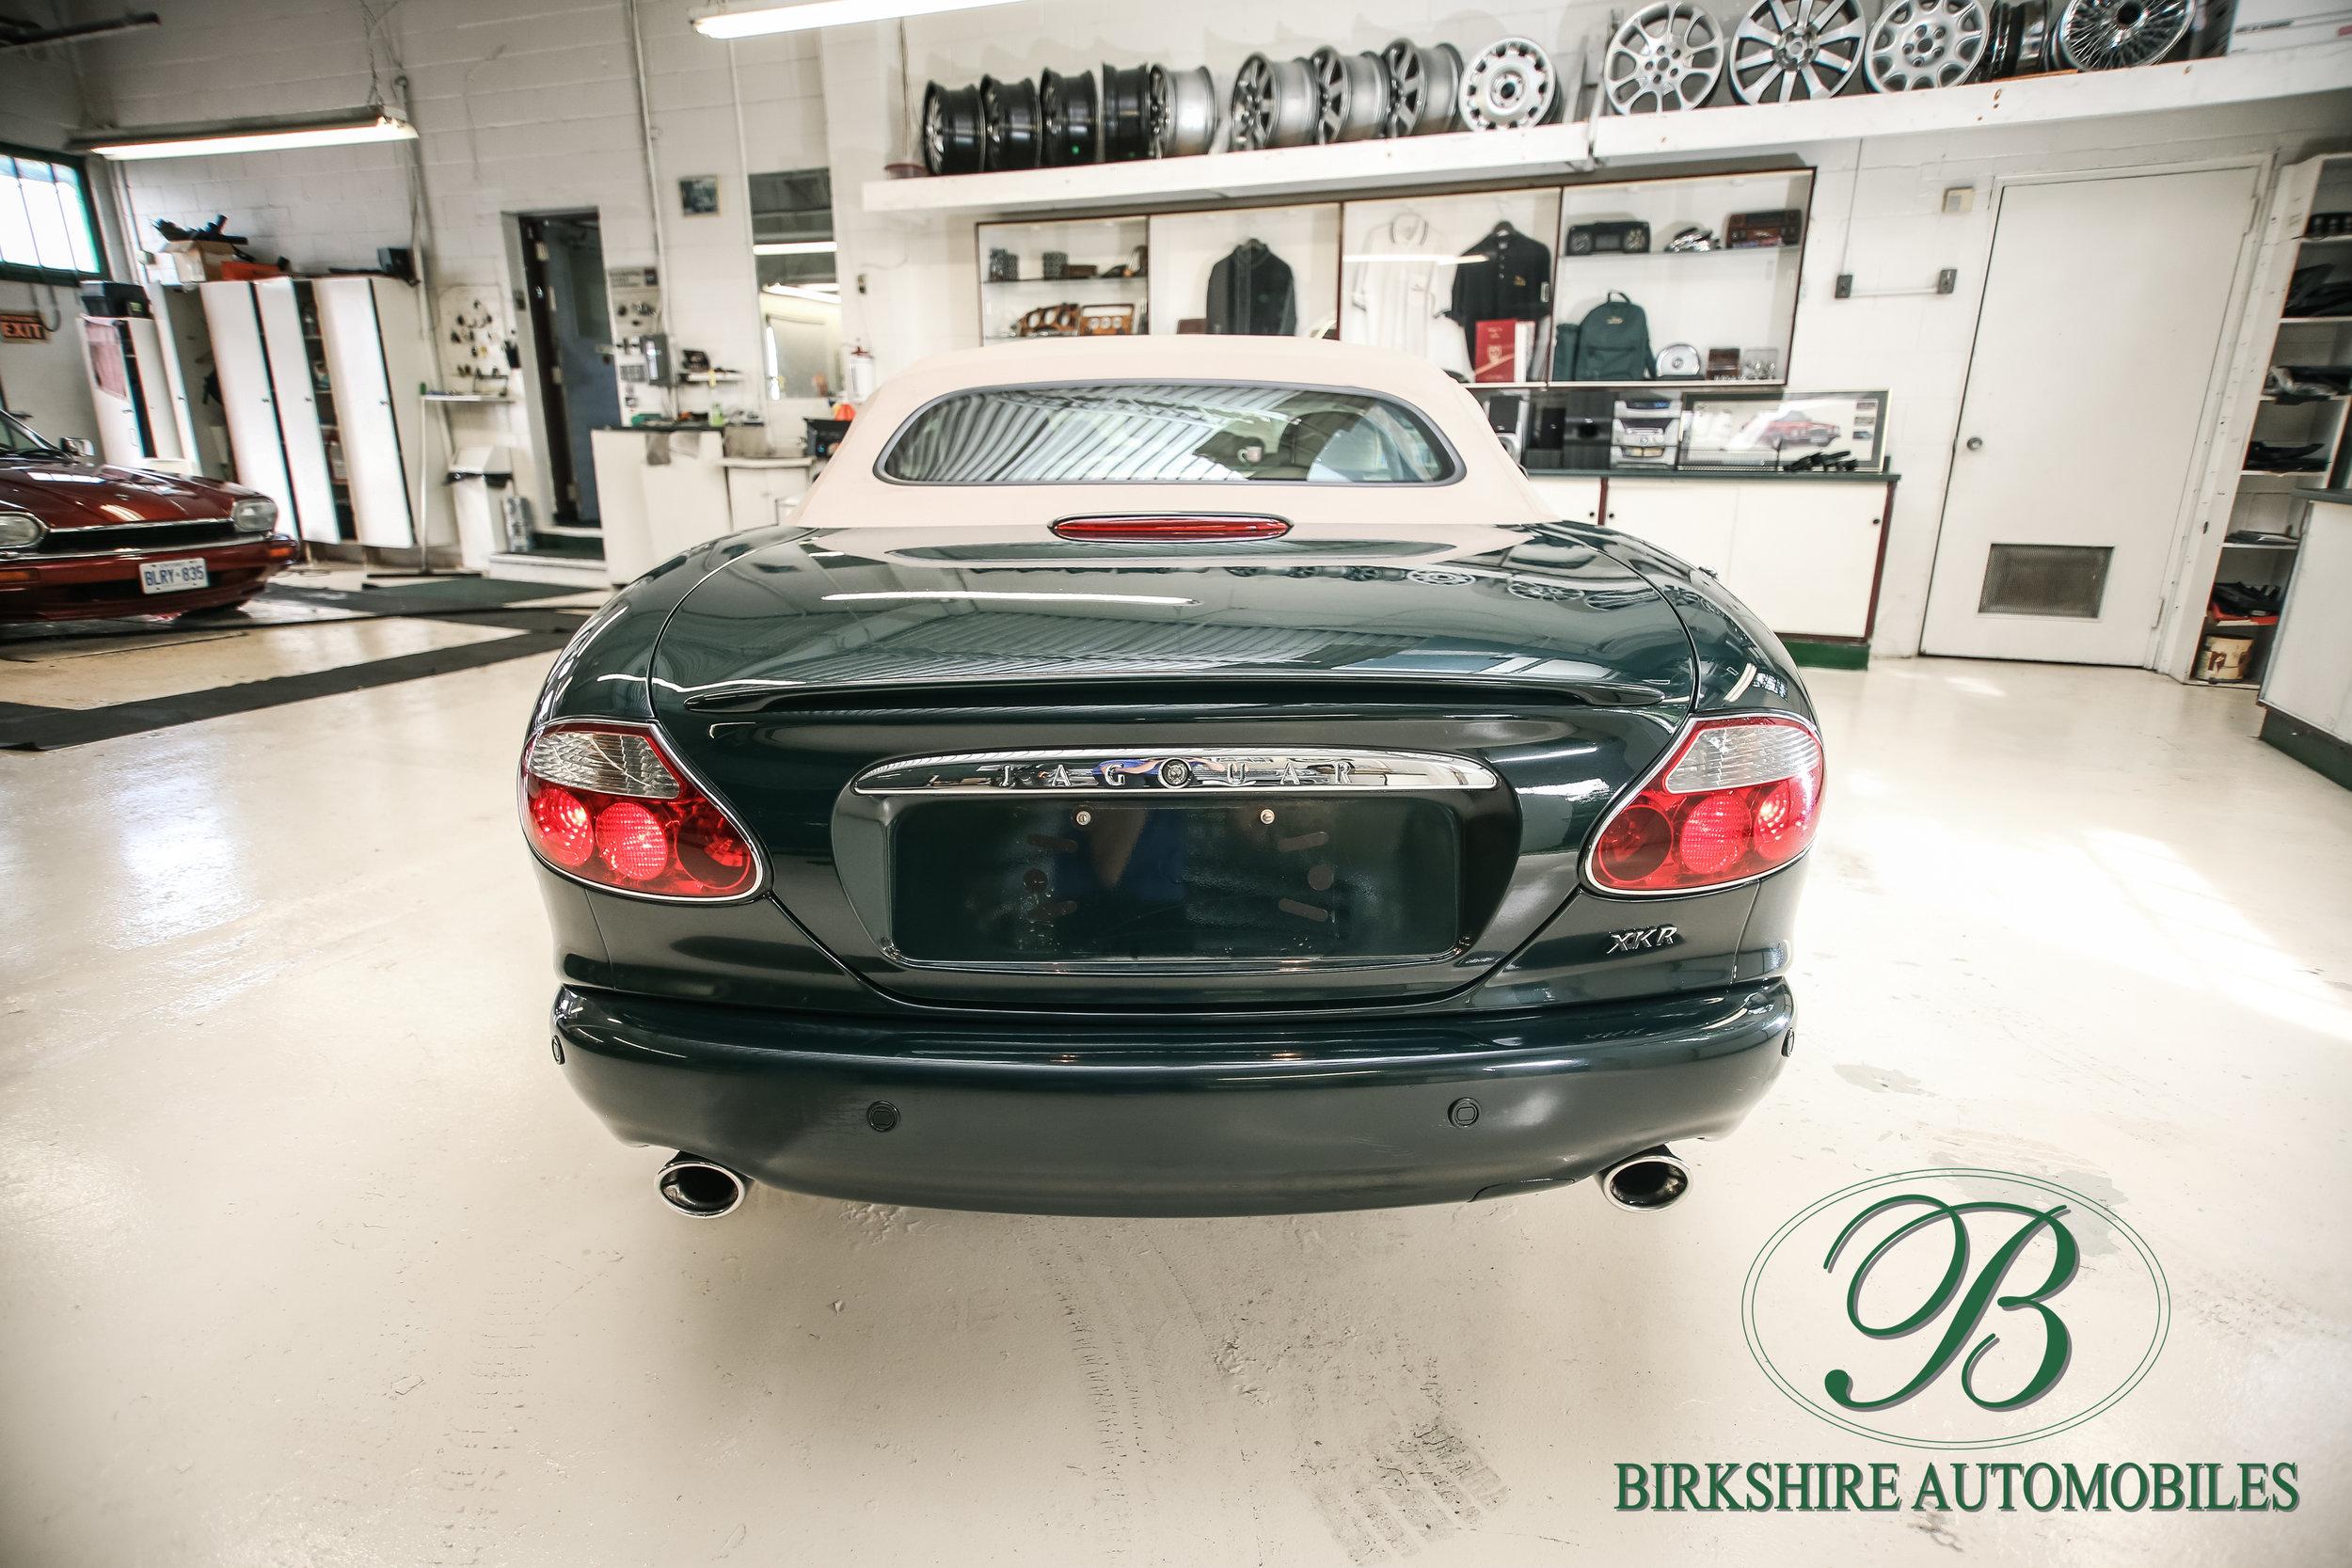 Birkshire Automobiles-2001 Jaguar XKR Convertible (27).jpg